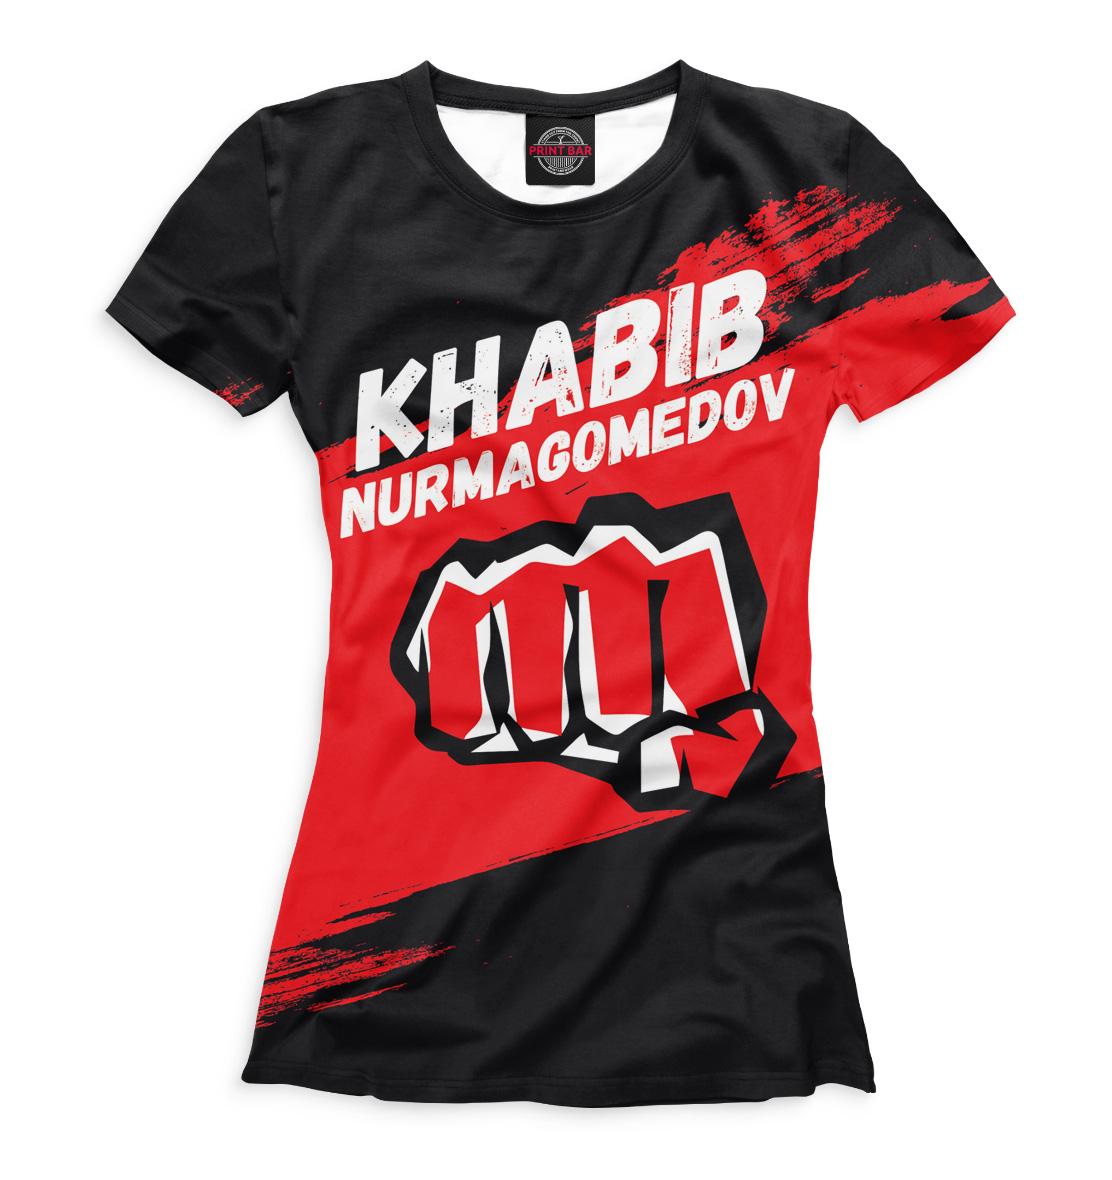 Купить Хабиб Нурмагомедов, Printbar, Футболки, MNU-925170-fut-1